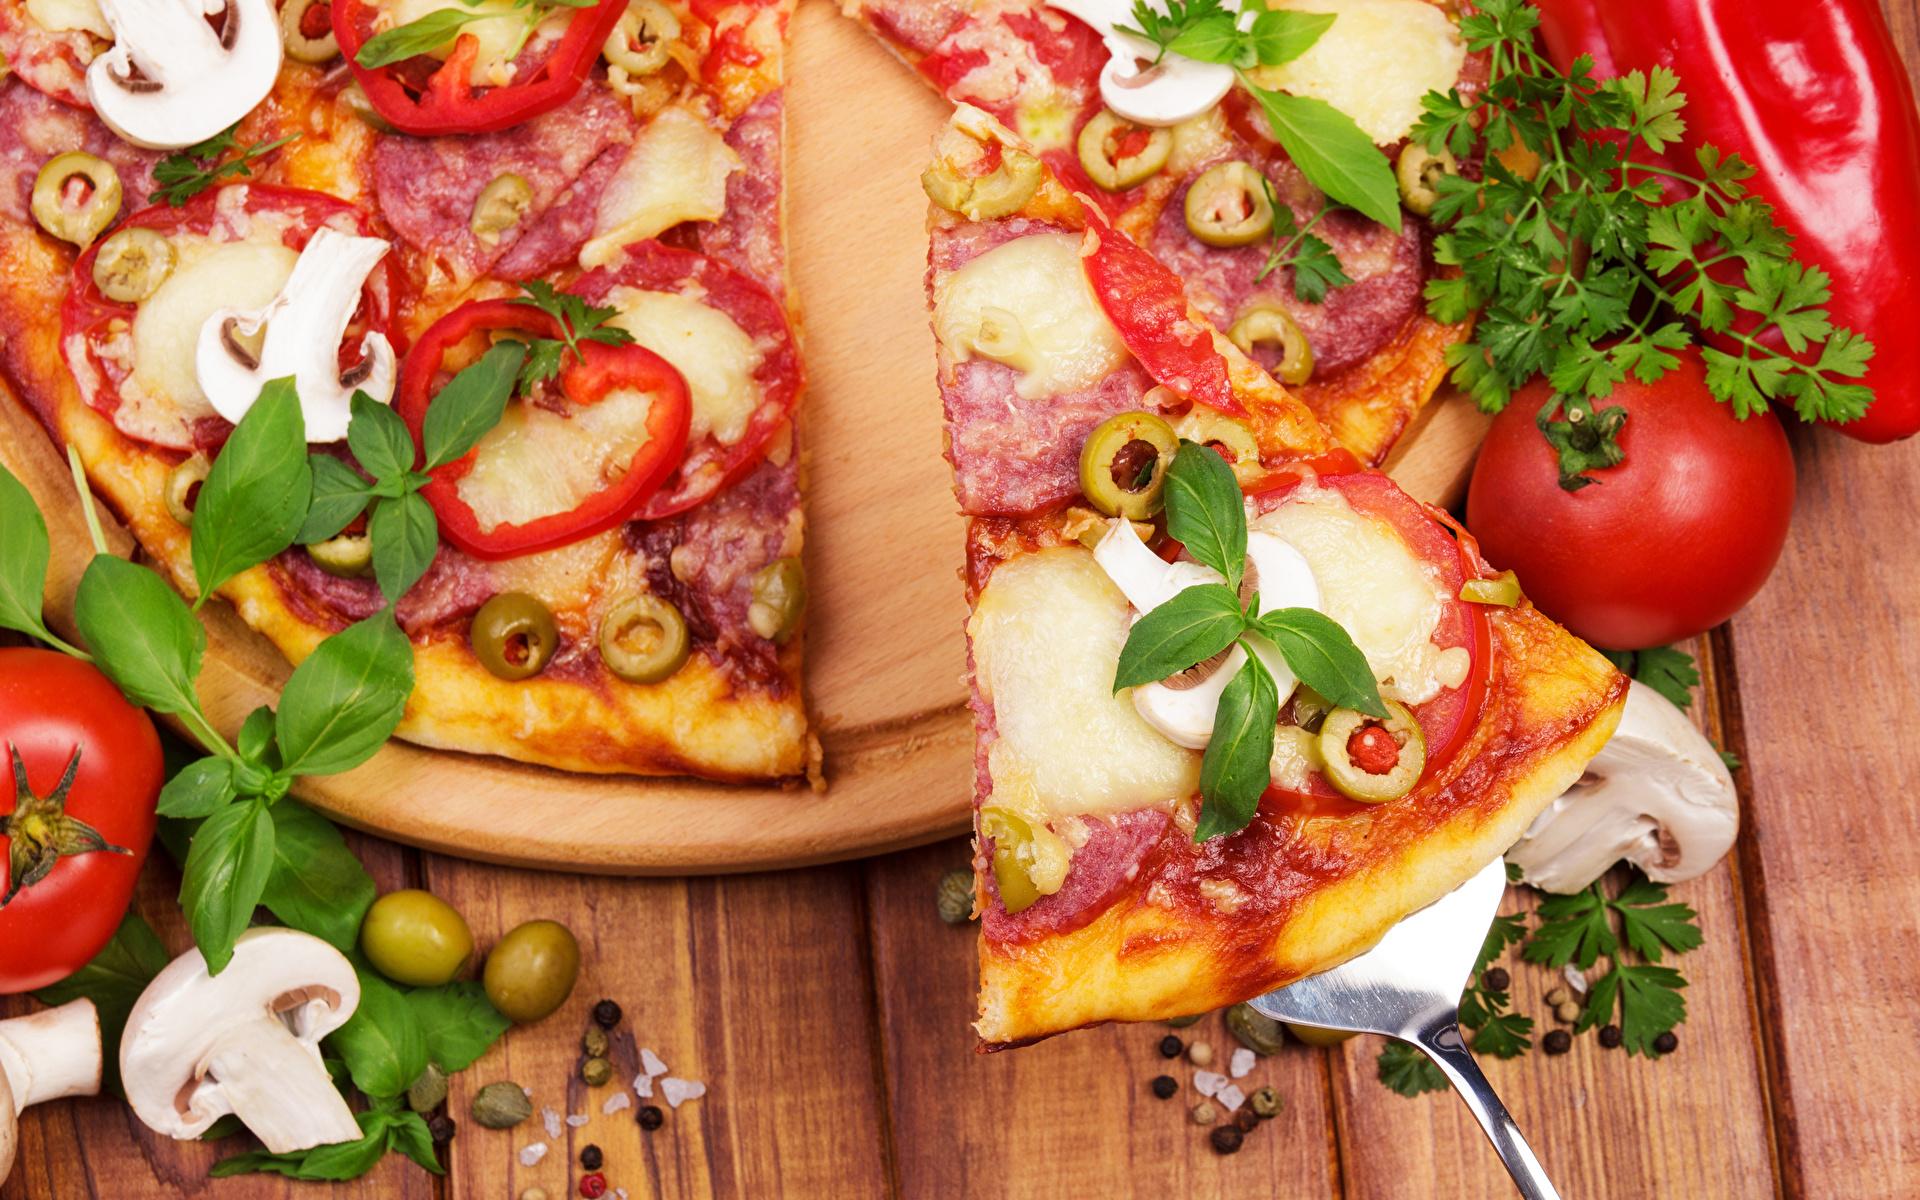 Fotos von Lebensmittel Pizza Tomaten Pilze Fast food Basilikum Großansicht 1920x1200 das Essen Tomate Königskraut Basilienkraut hautnah Nahaufnahme